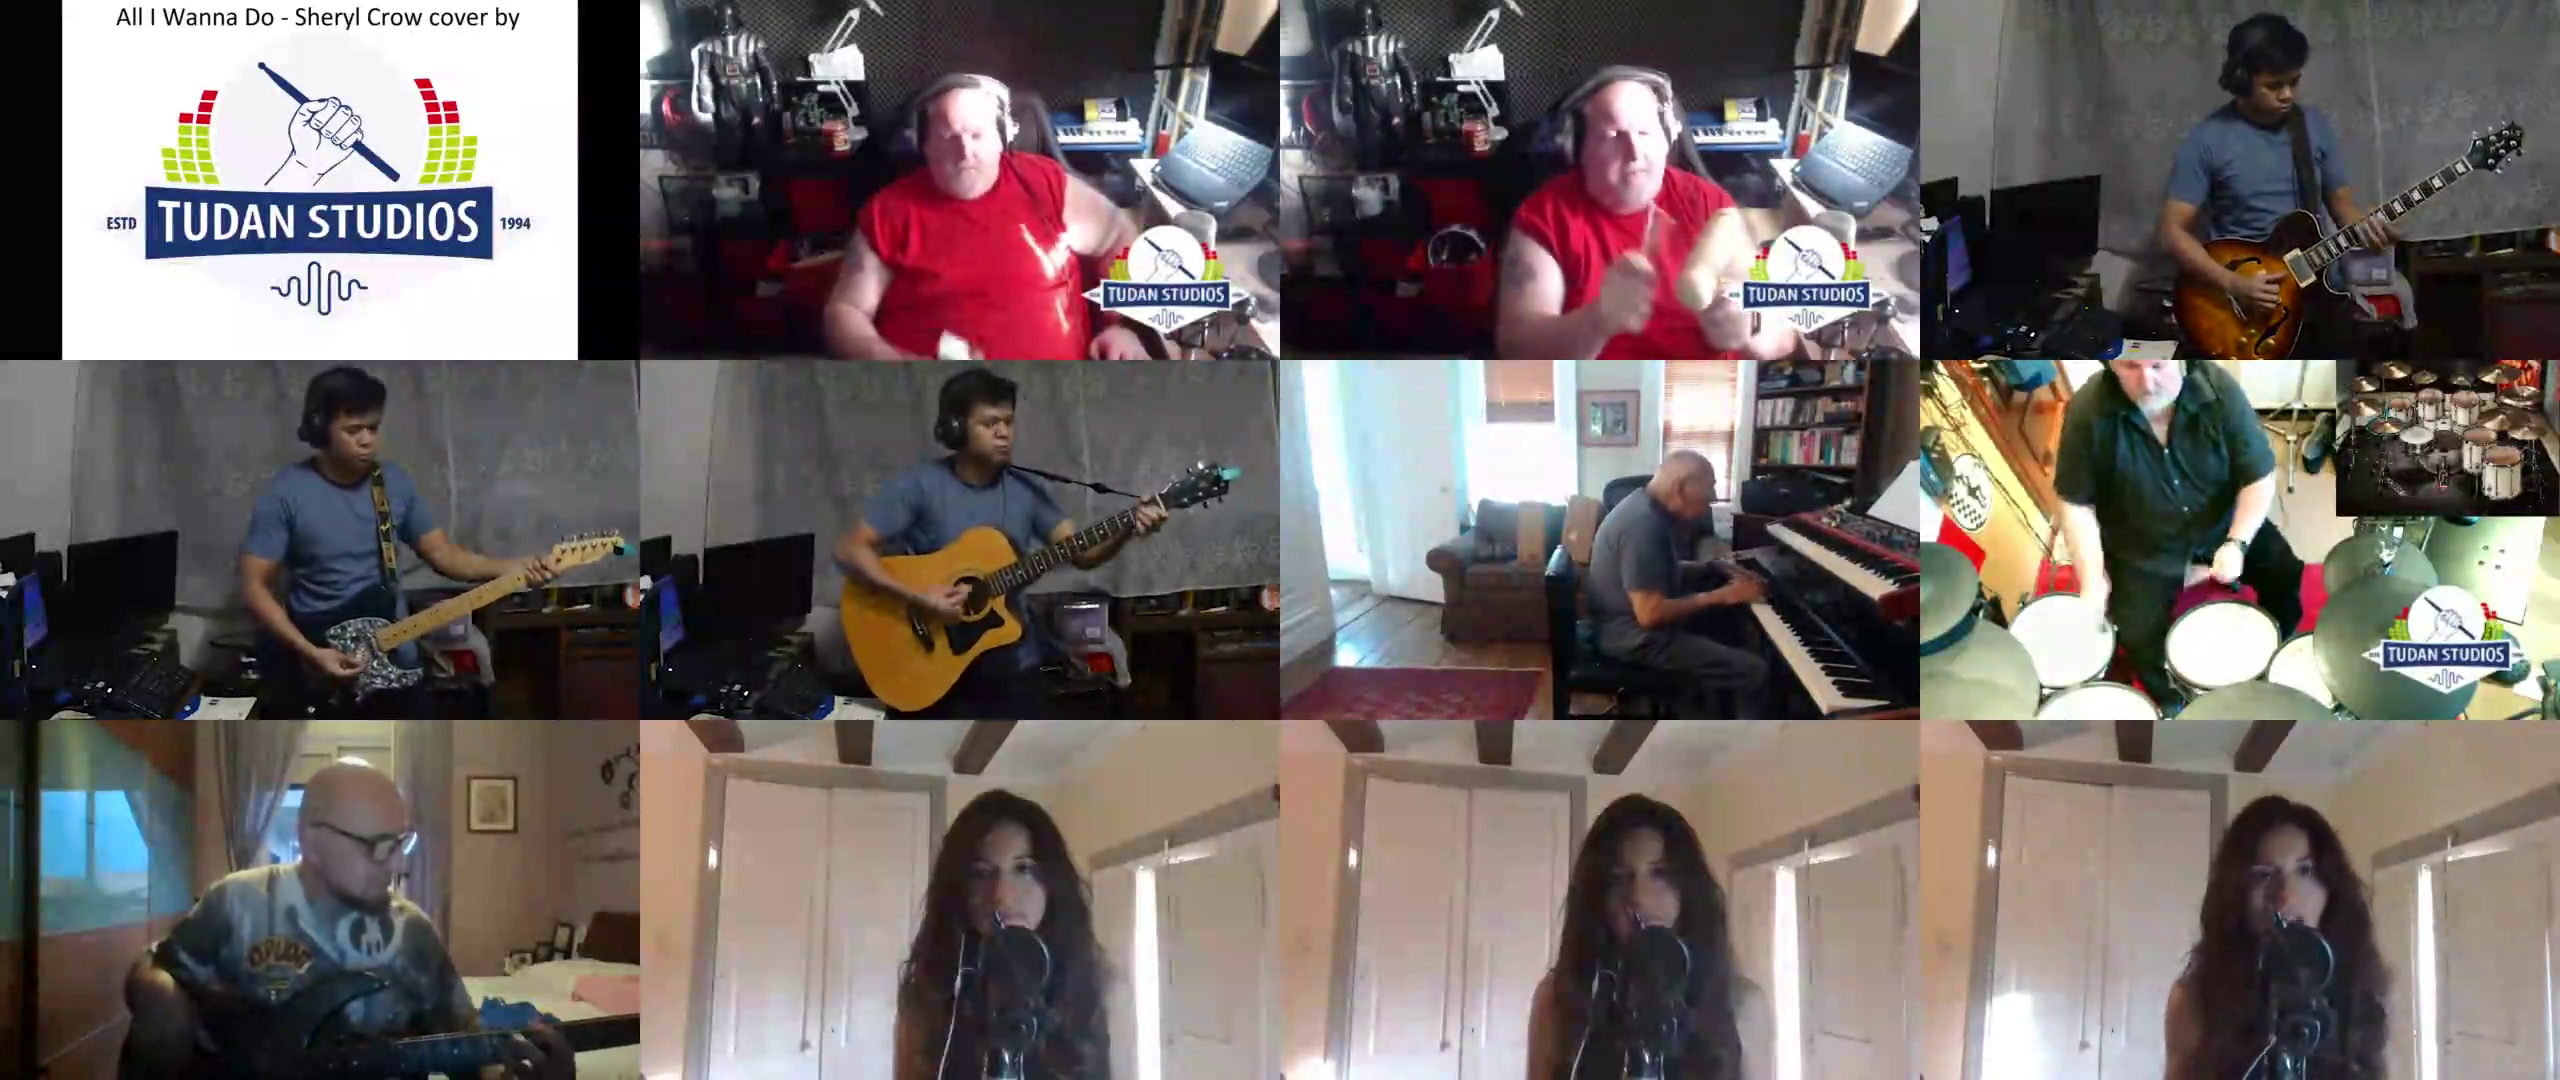 Sheryl Crow - All I Wanna Do cover by Tudanstudios